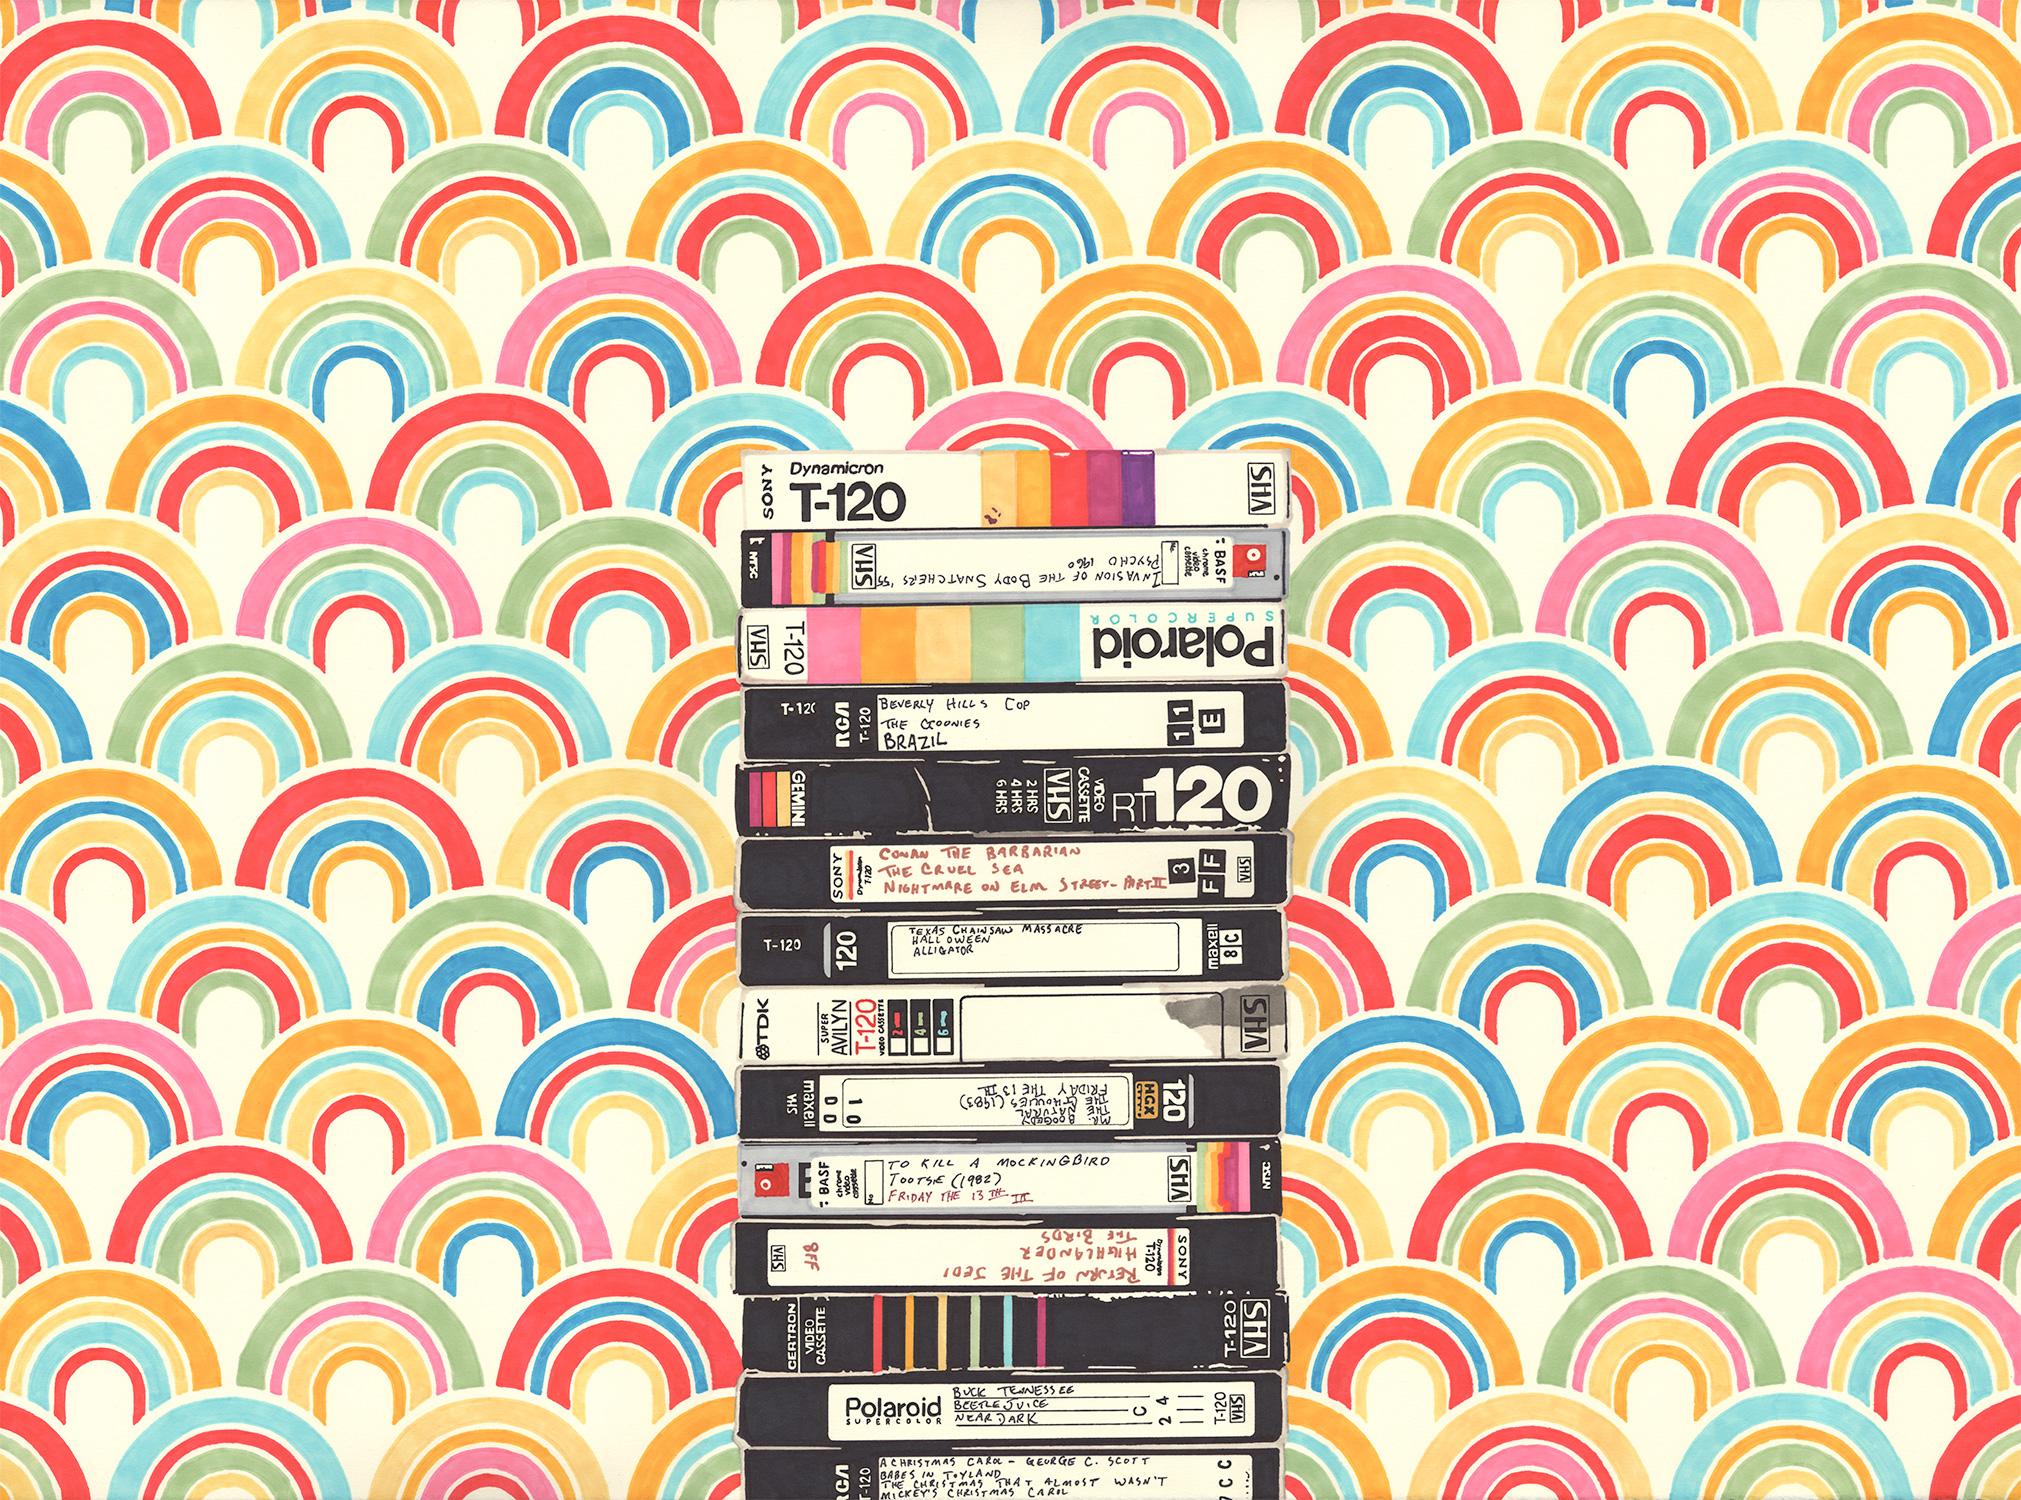 VHS & Rainbows